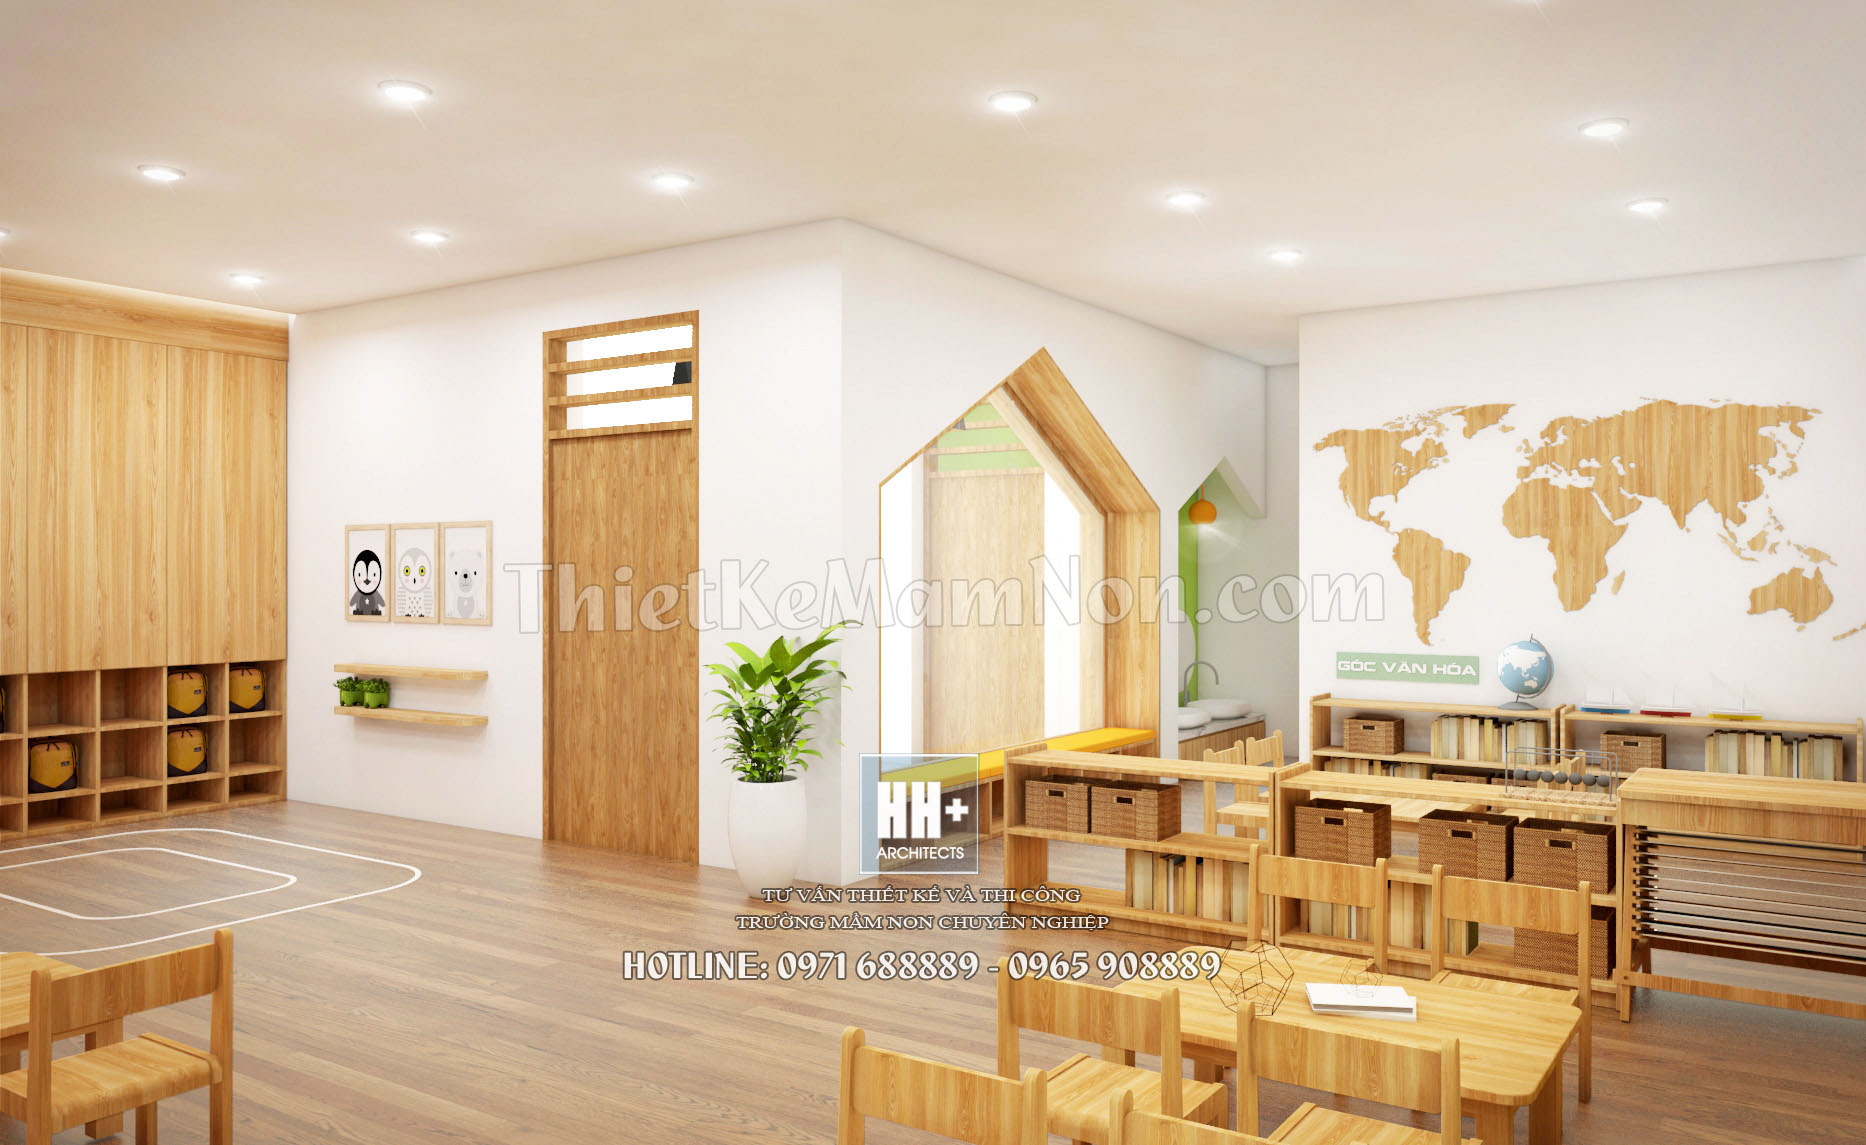 9 thiết kế trường mầm non montessori Thiết kế trường mầm non montessori Việt Anh 9 1